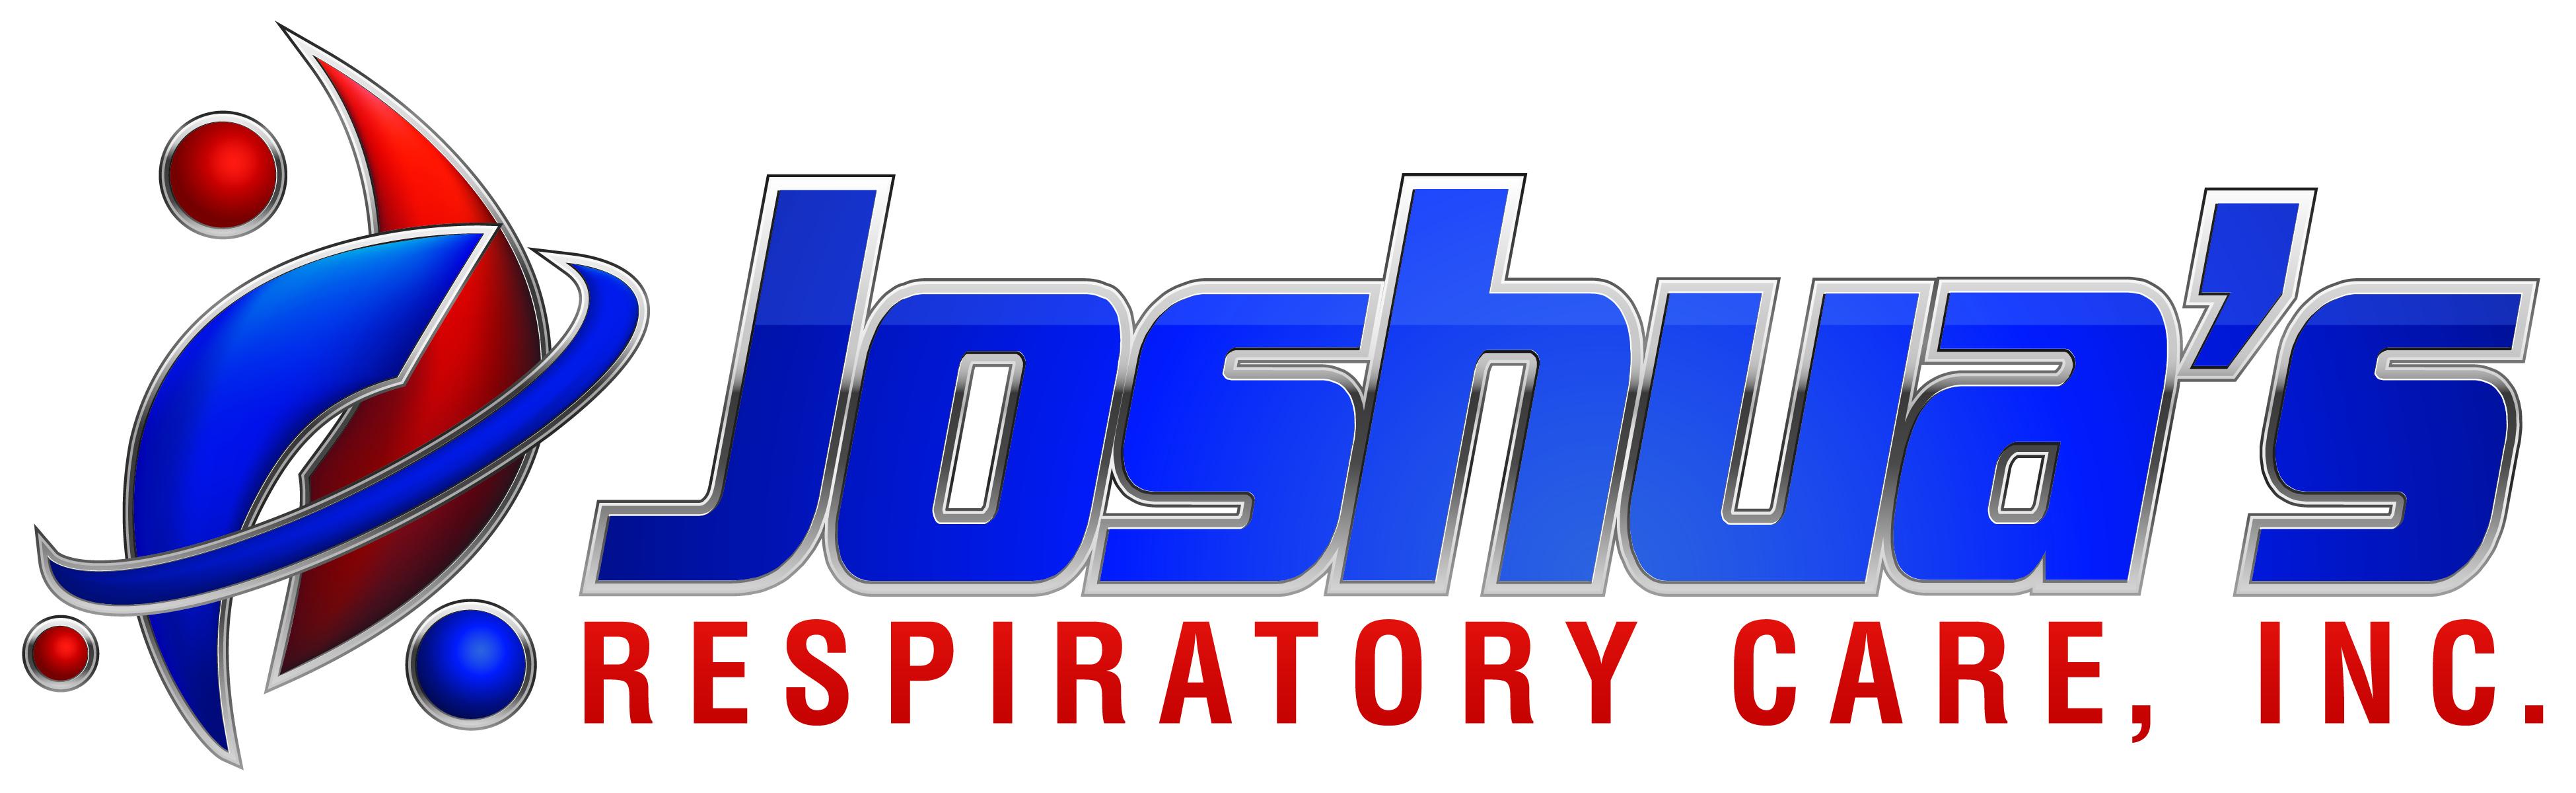 Joshua's-01